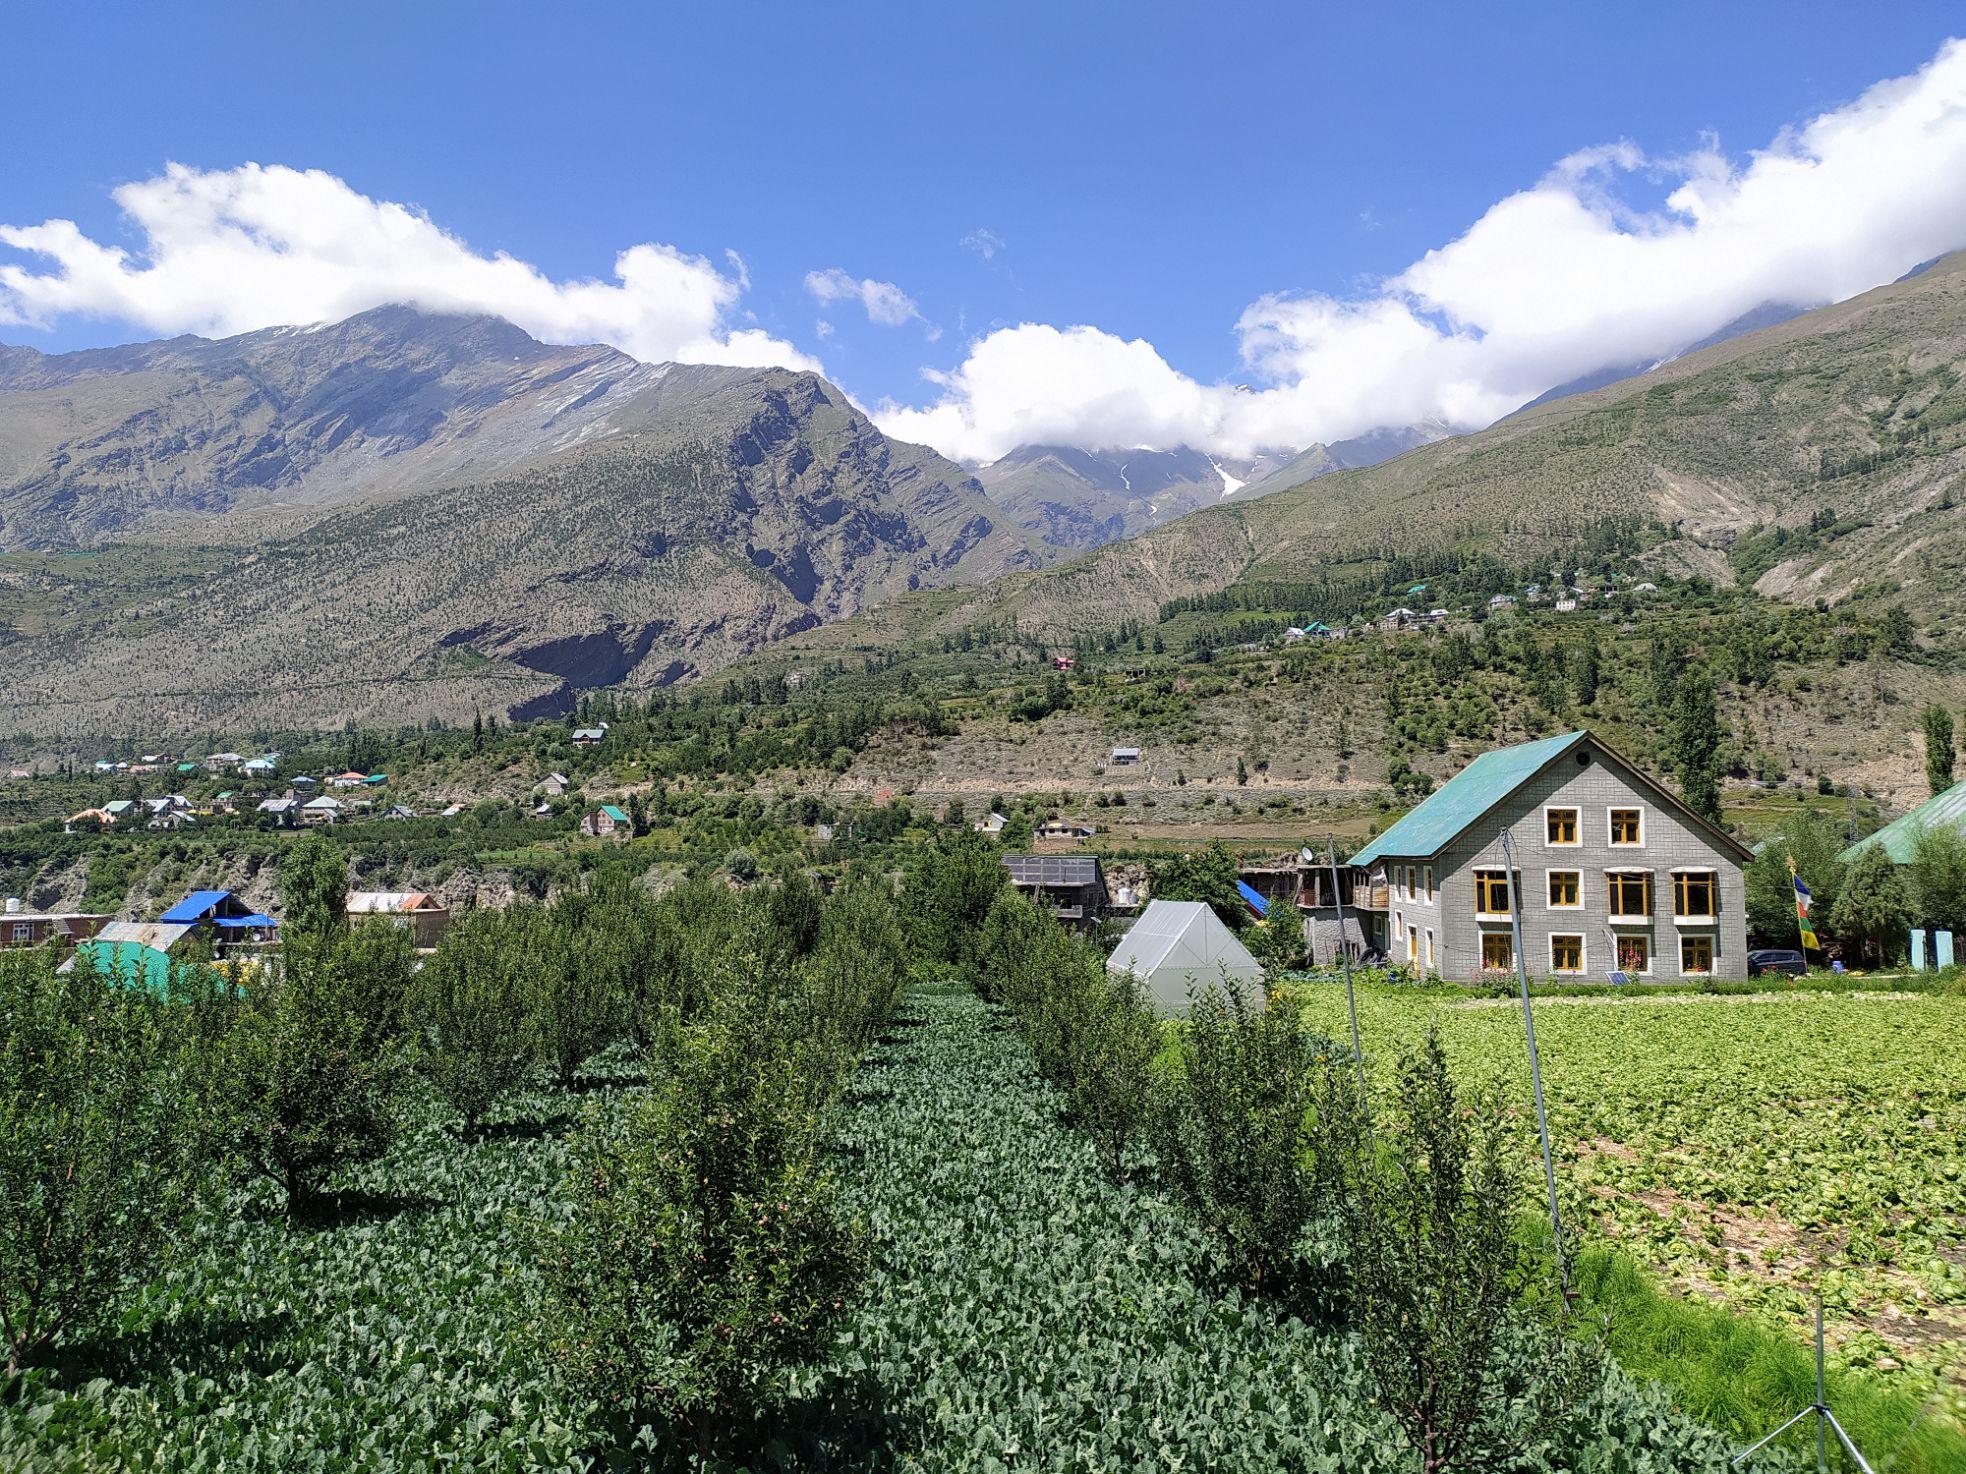 Jobrang village, Lahaul Valley, Himachal Pradesh